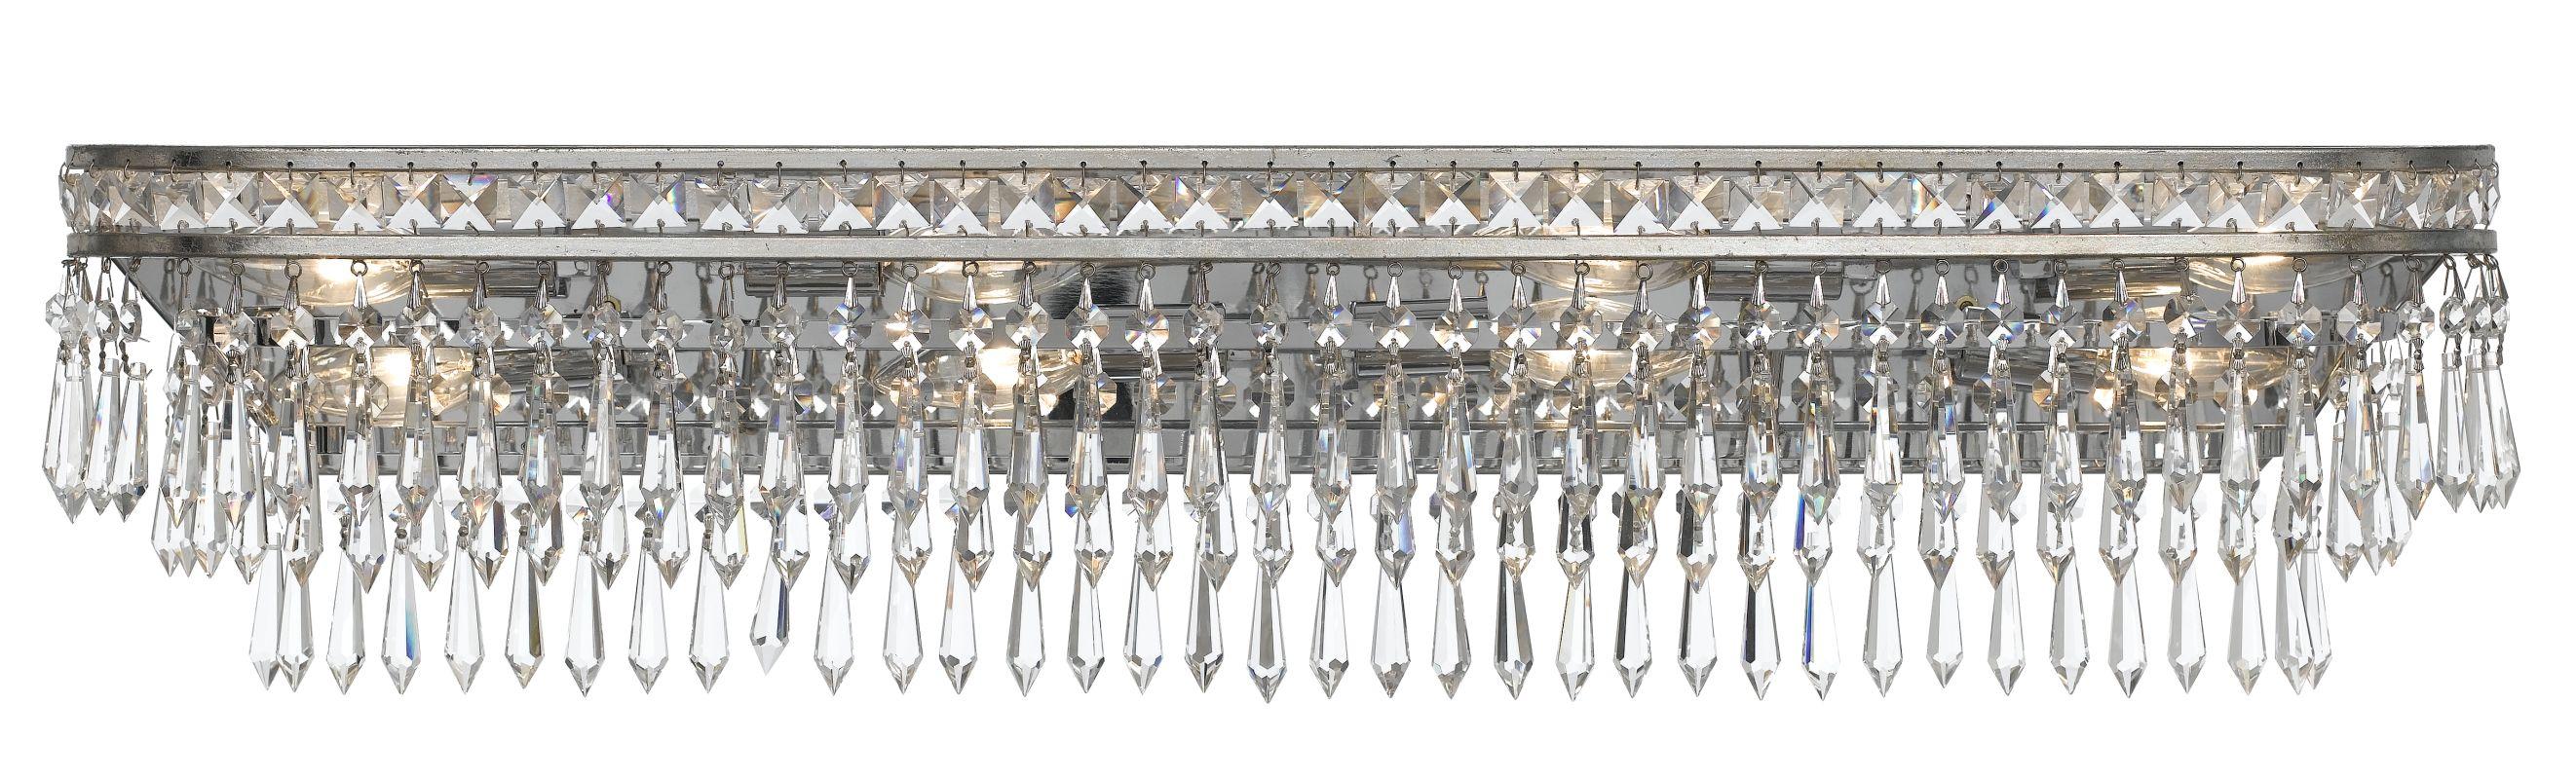 Crystorama Lighting Group 5267 Mercer 8 Light Bathroom Vanity Light Sale $650.00 ITEM#: 2362510 MODEL# :5267-OS-CL-MWP UPC#: 633779024740 :